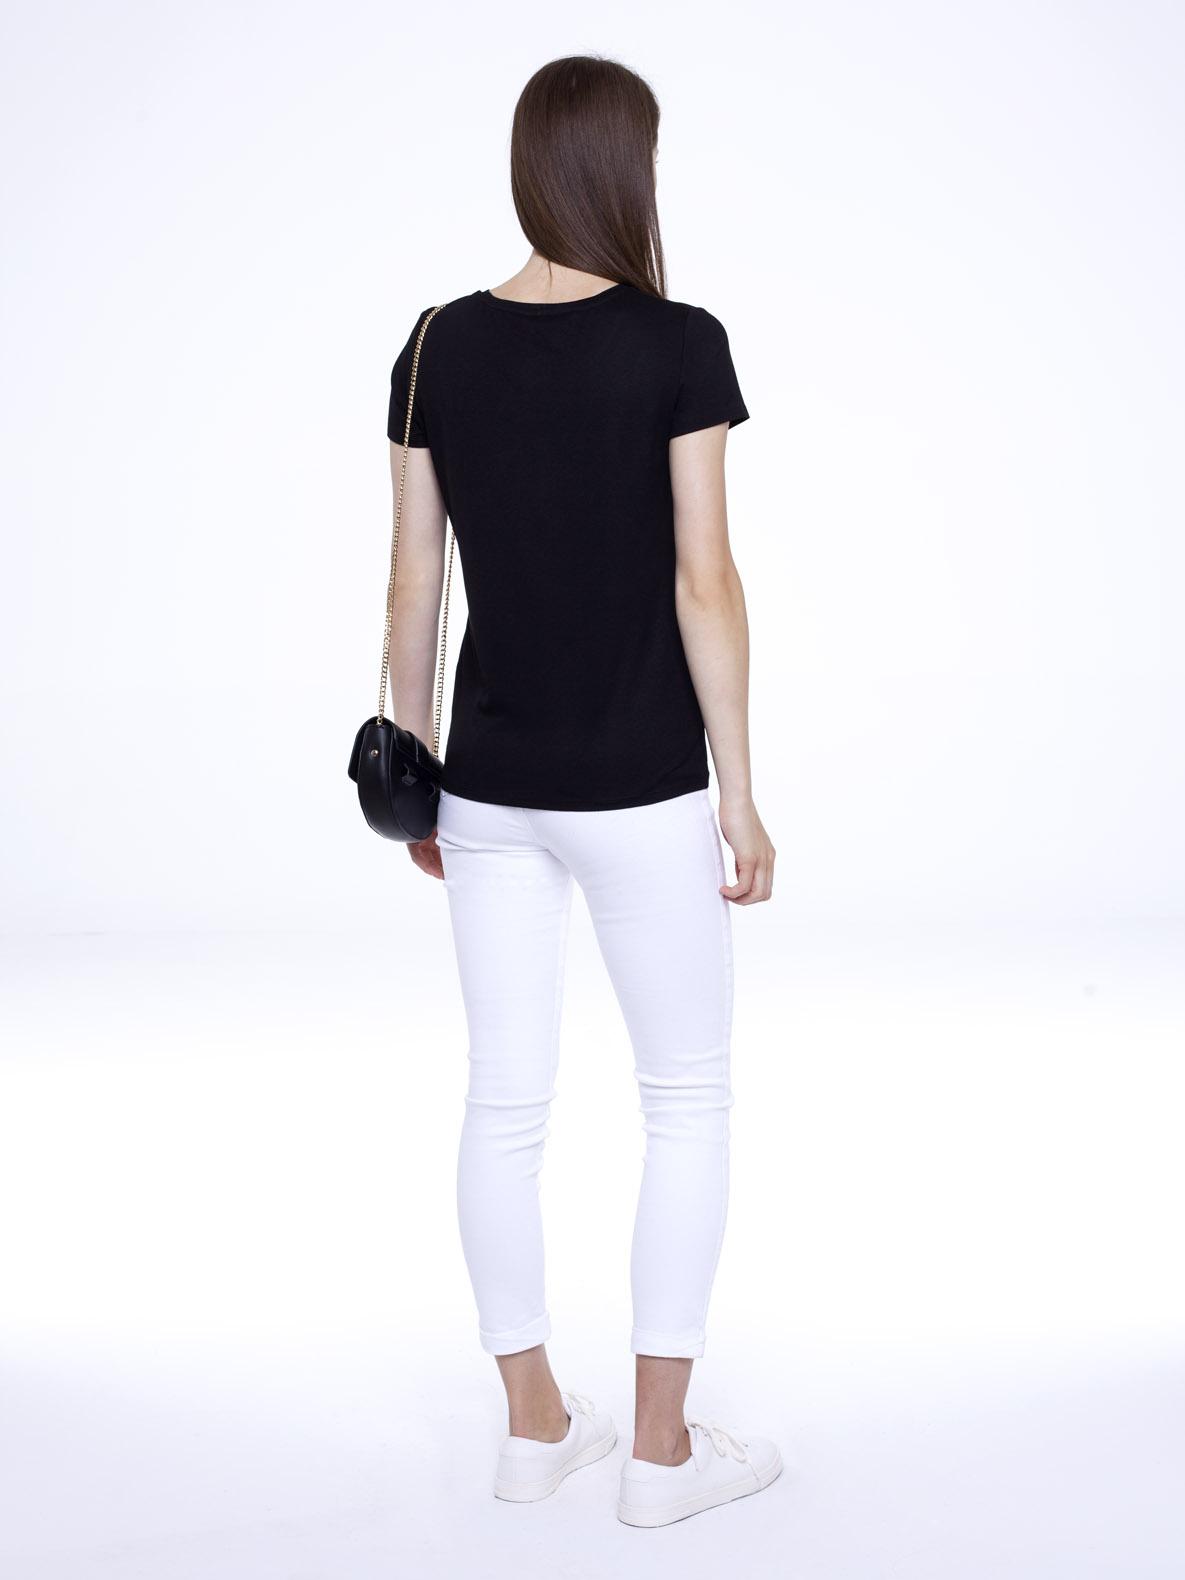 T-shirt She black